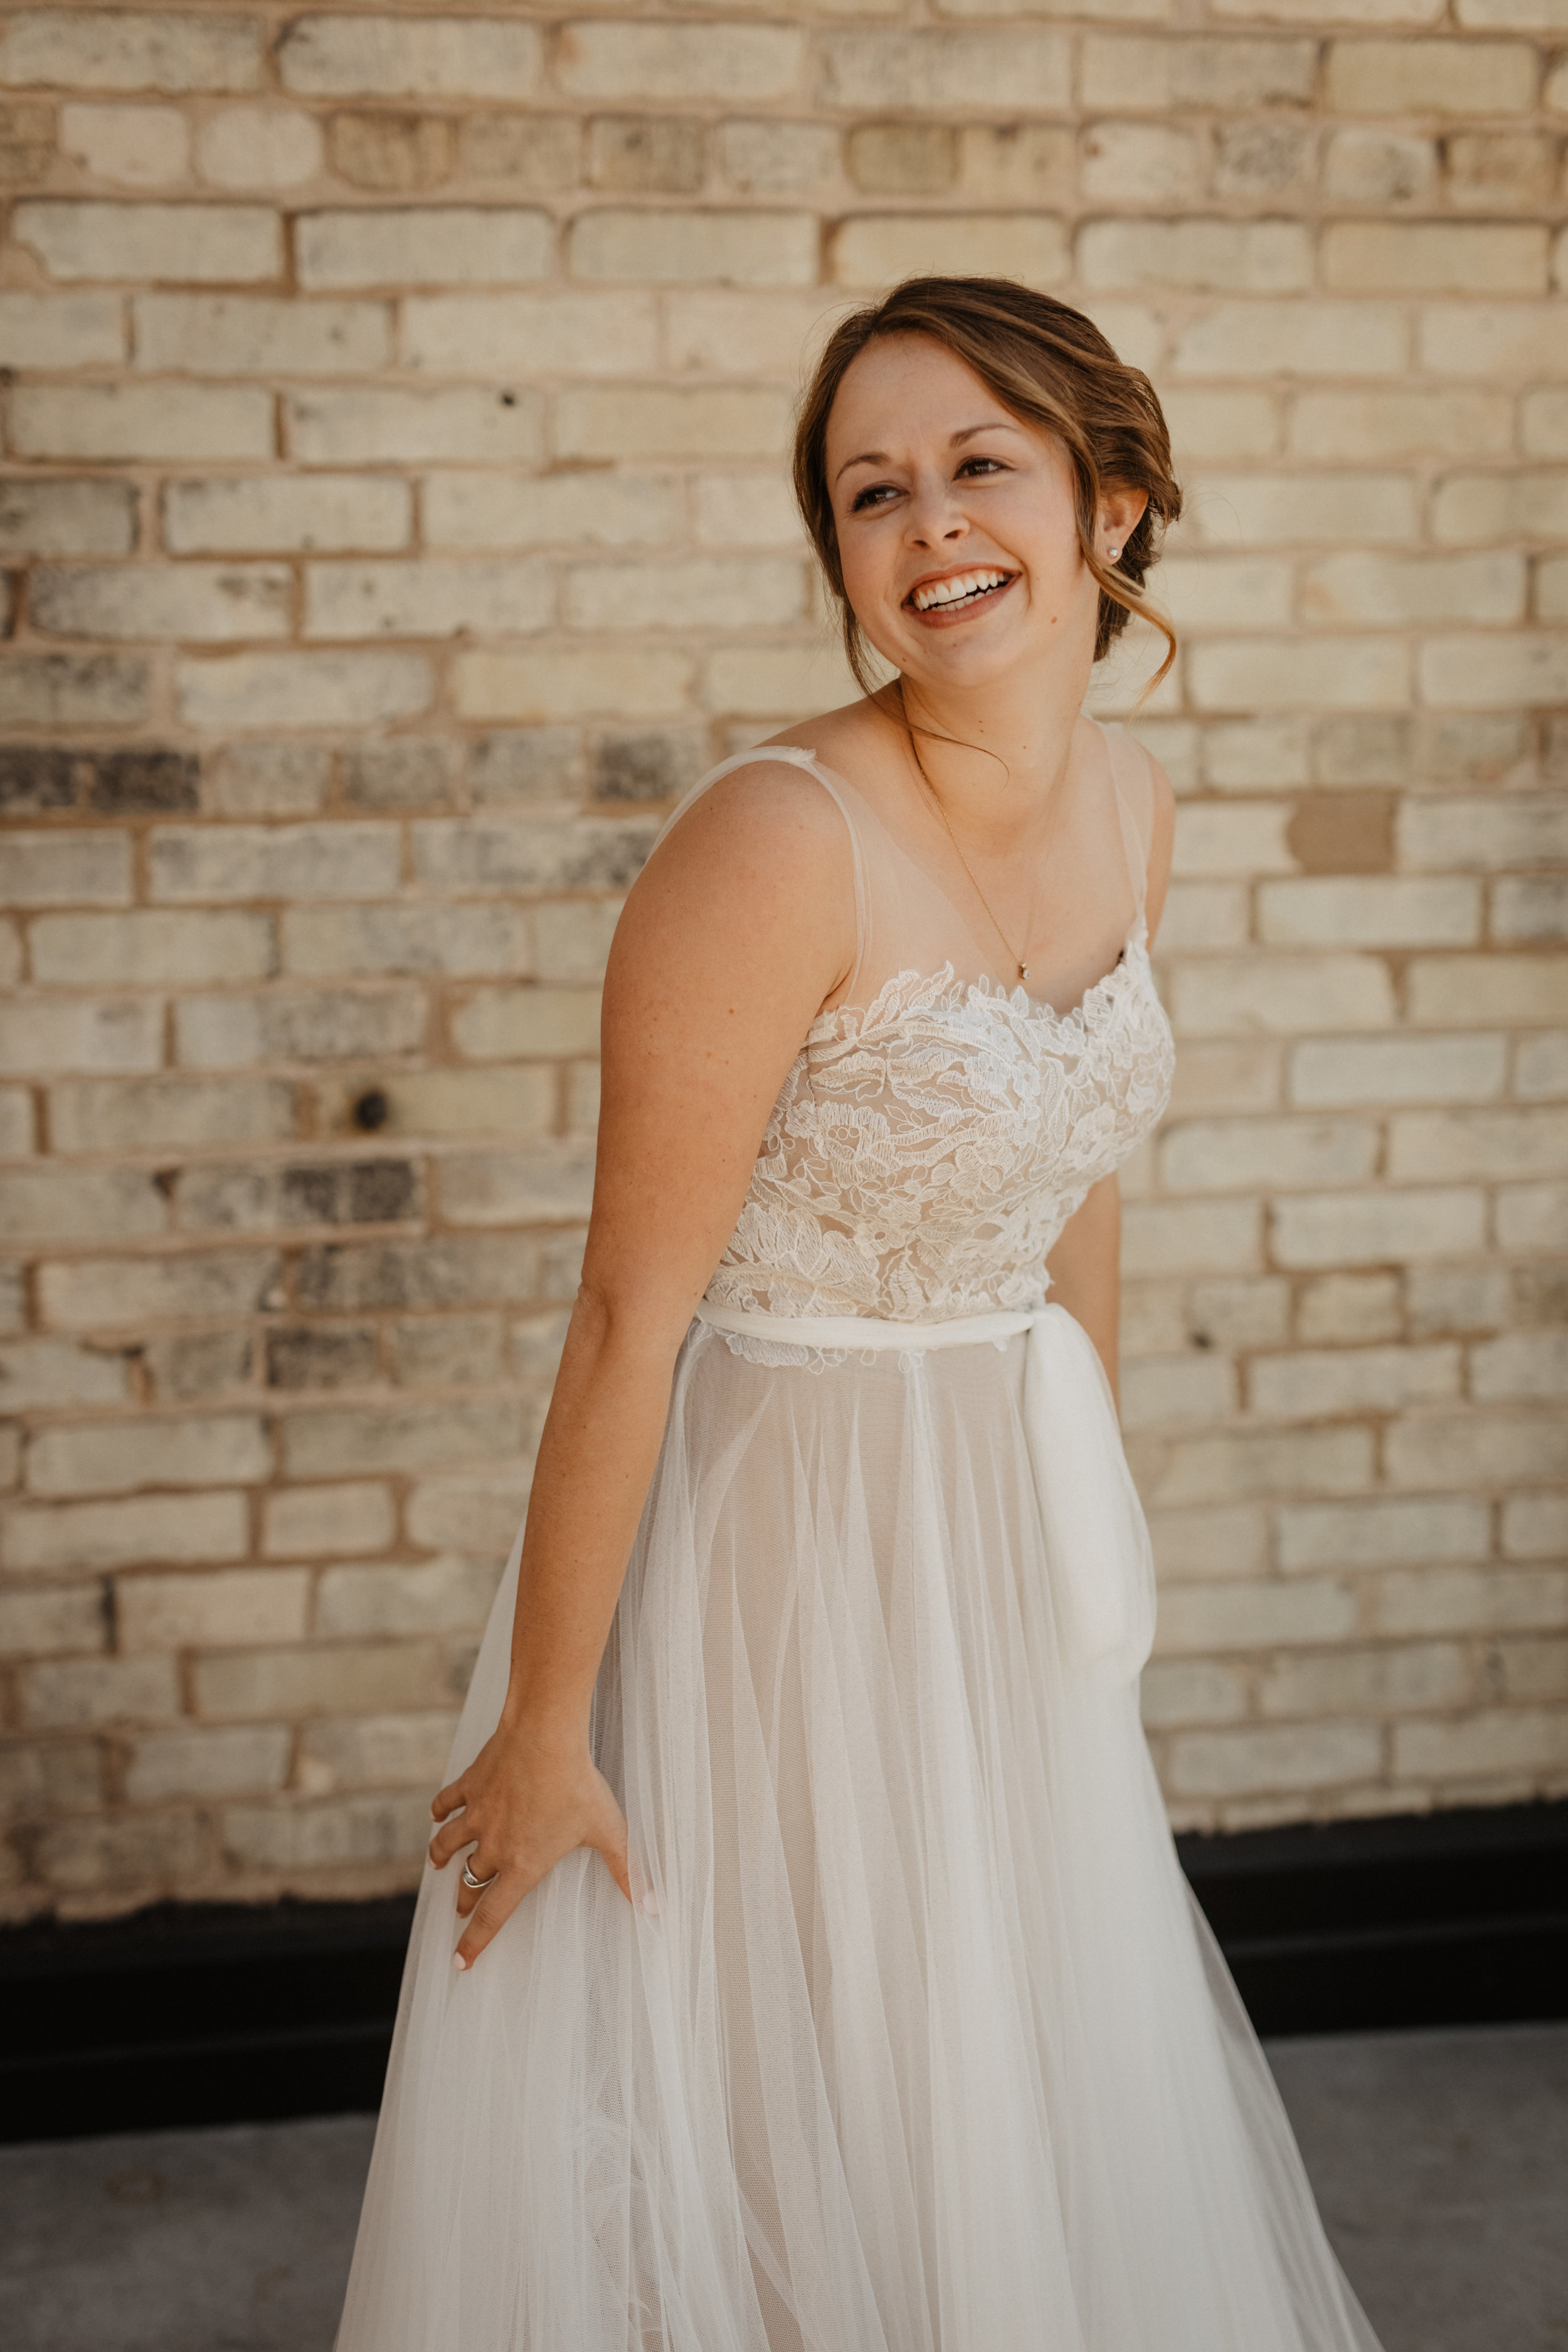 Bride-Wedding-Day-02